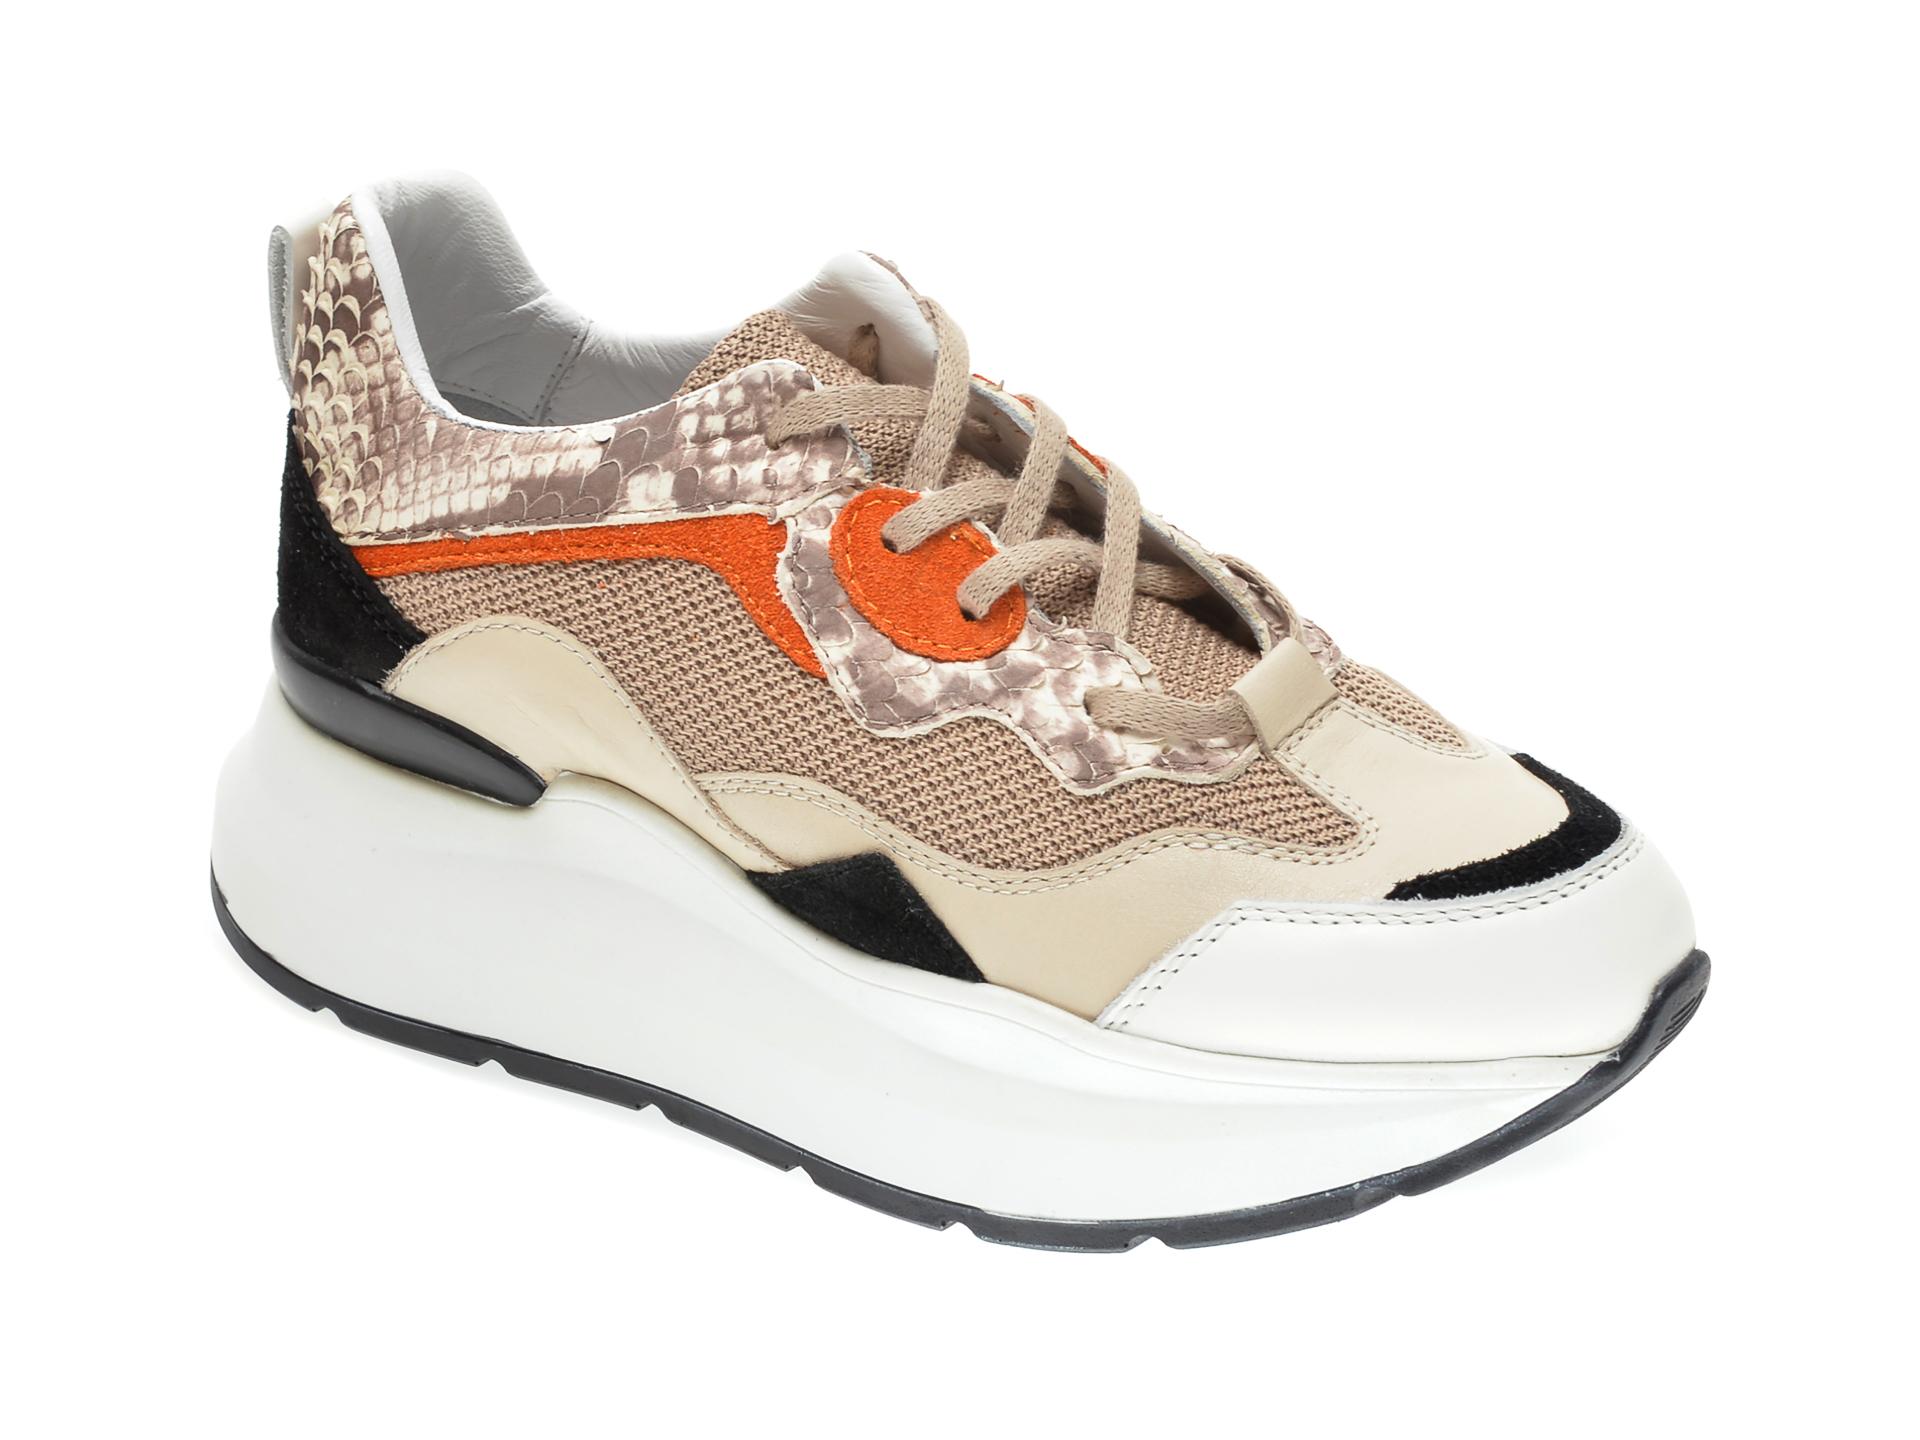 Pantofi sport RADIKAL bej, 2773, din piele naturala imagine